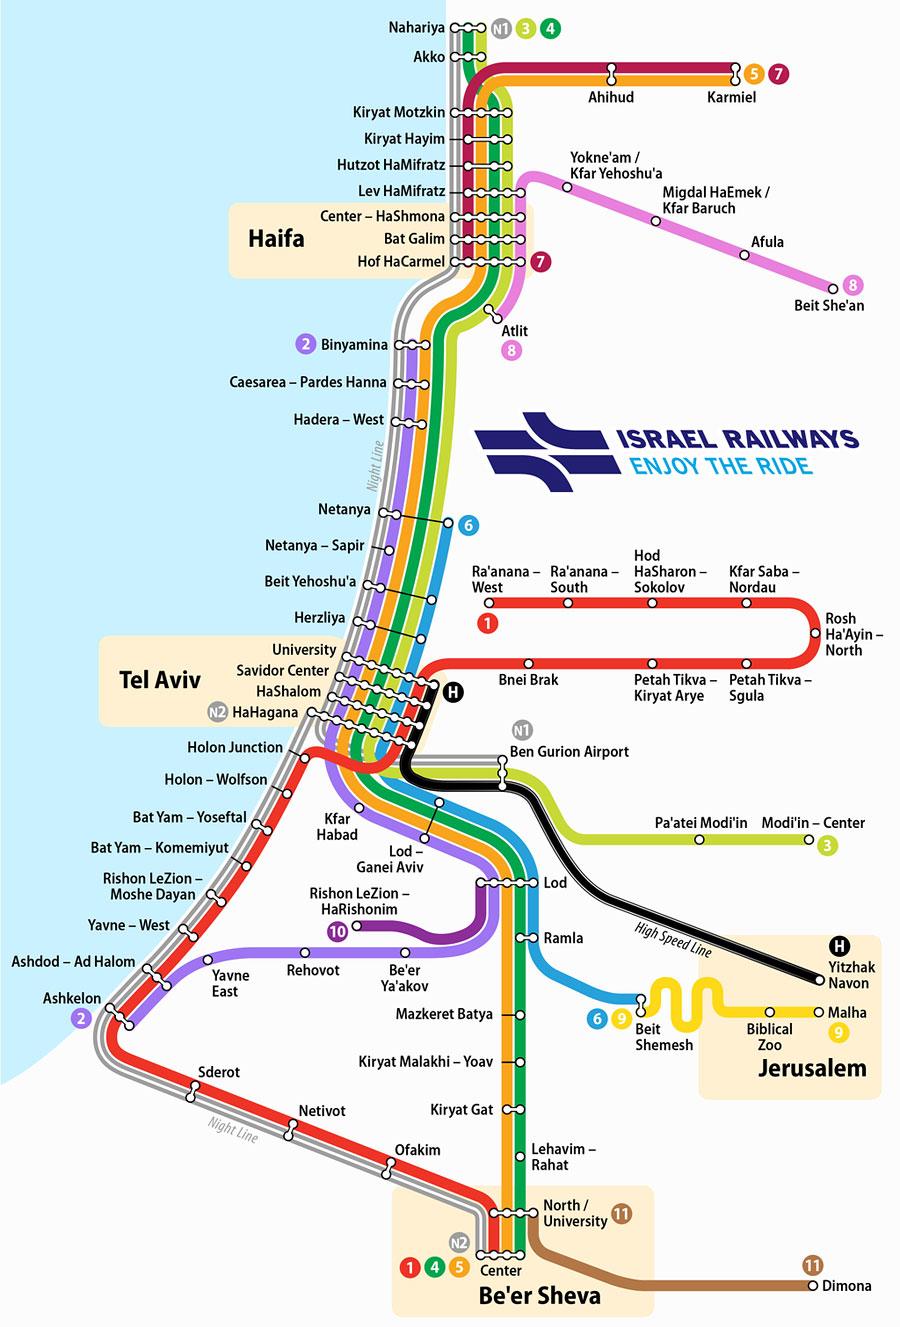 Streckennetz der Israel Railways. (© Maximilian Dörrbecker/Wikipedia CC BY-SA 2.5 - Stand: 2020)